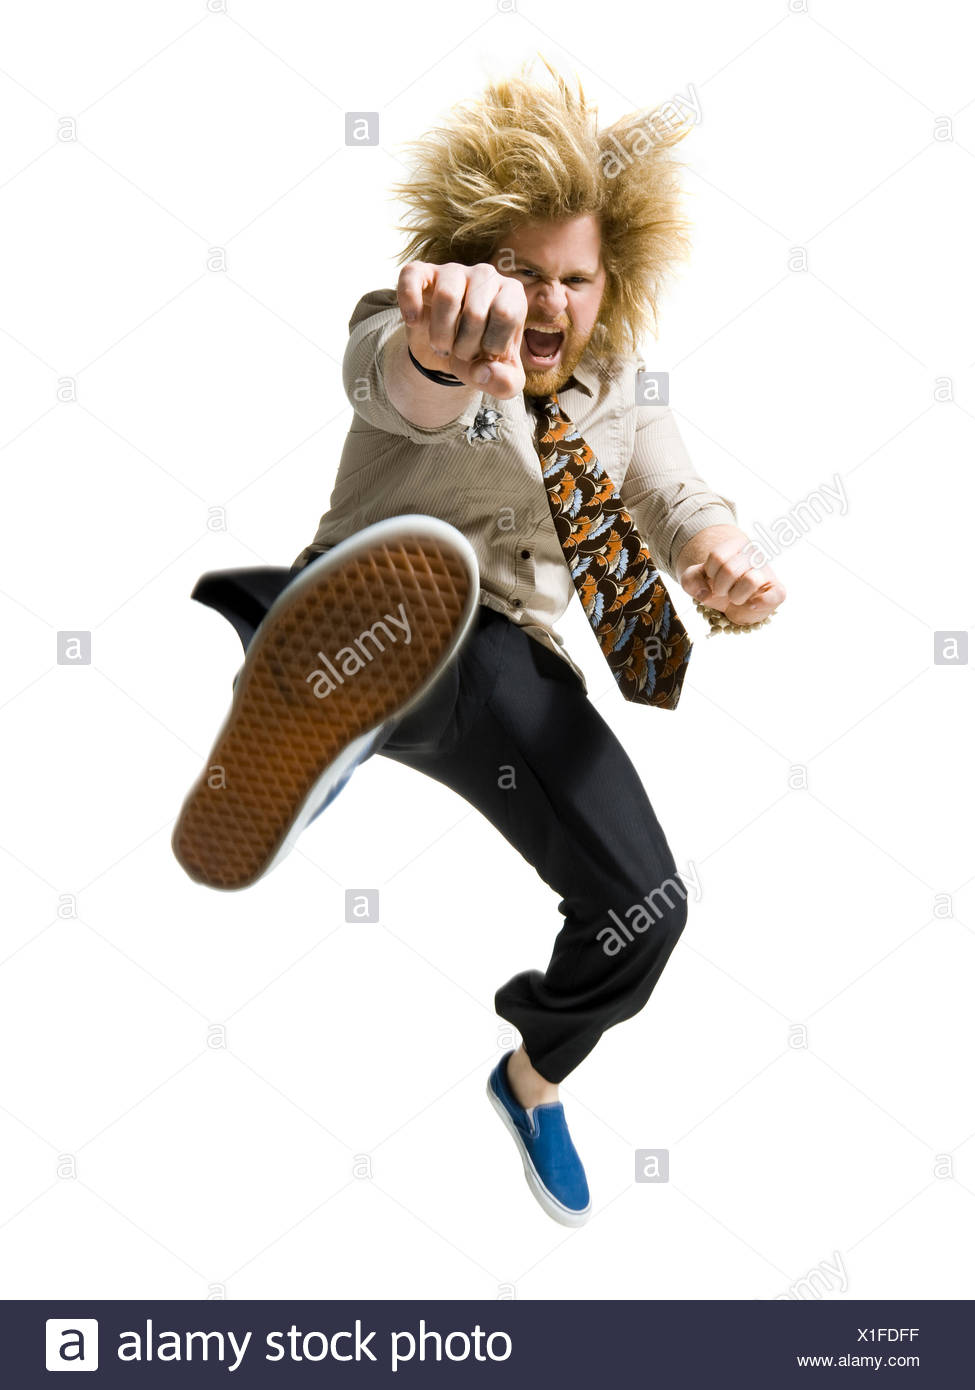 man kicking the air - Stock Image